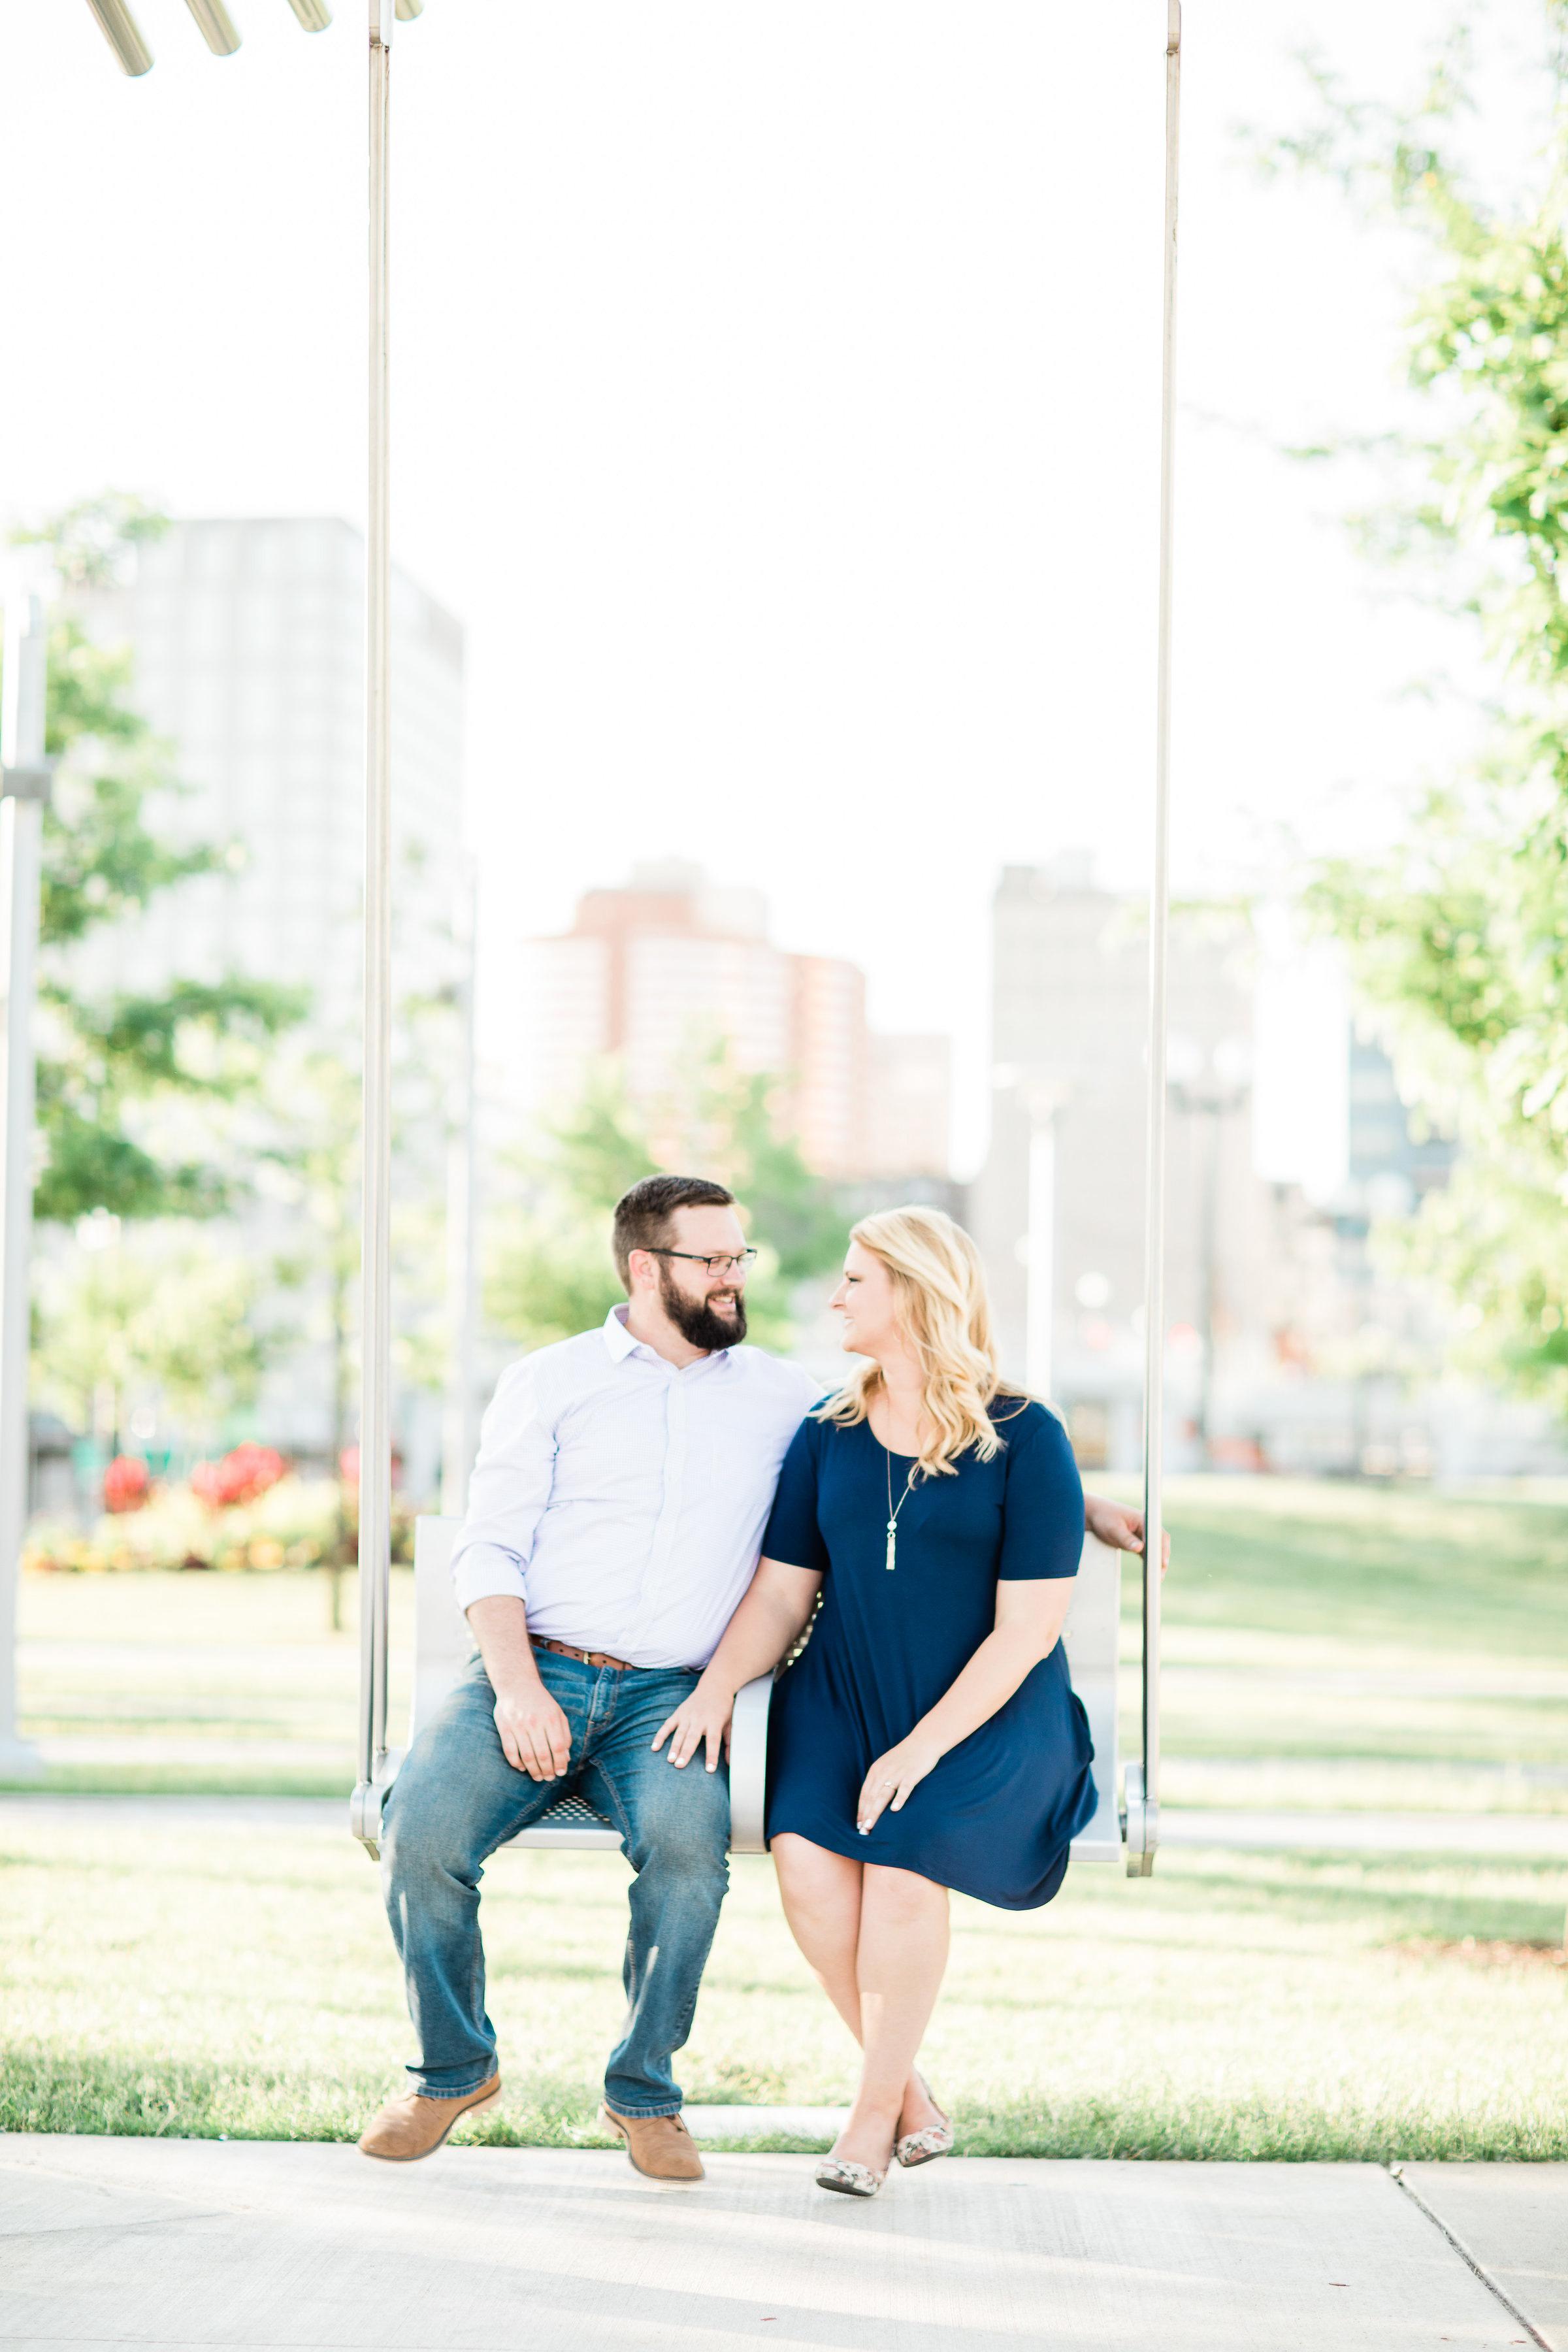 wedding photographer in cincinnati ohio lauren day photography-4.jpg